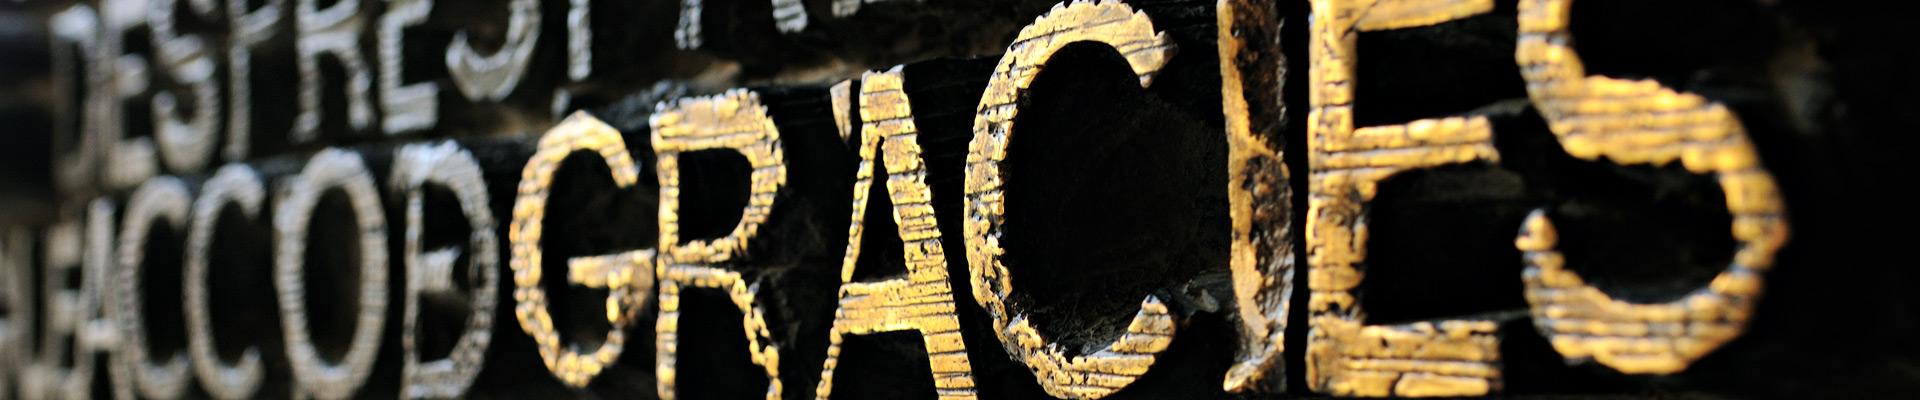 Top image gracies porte Sagrada Família